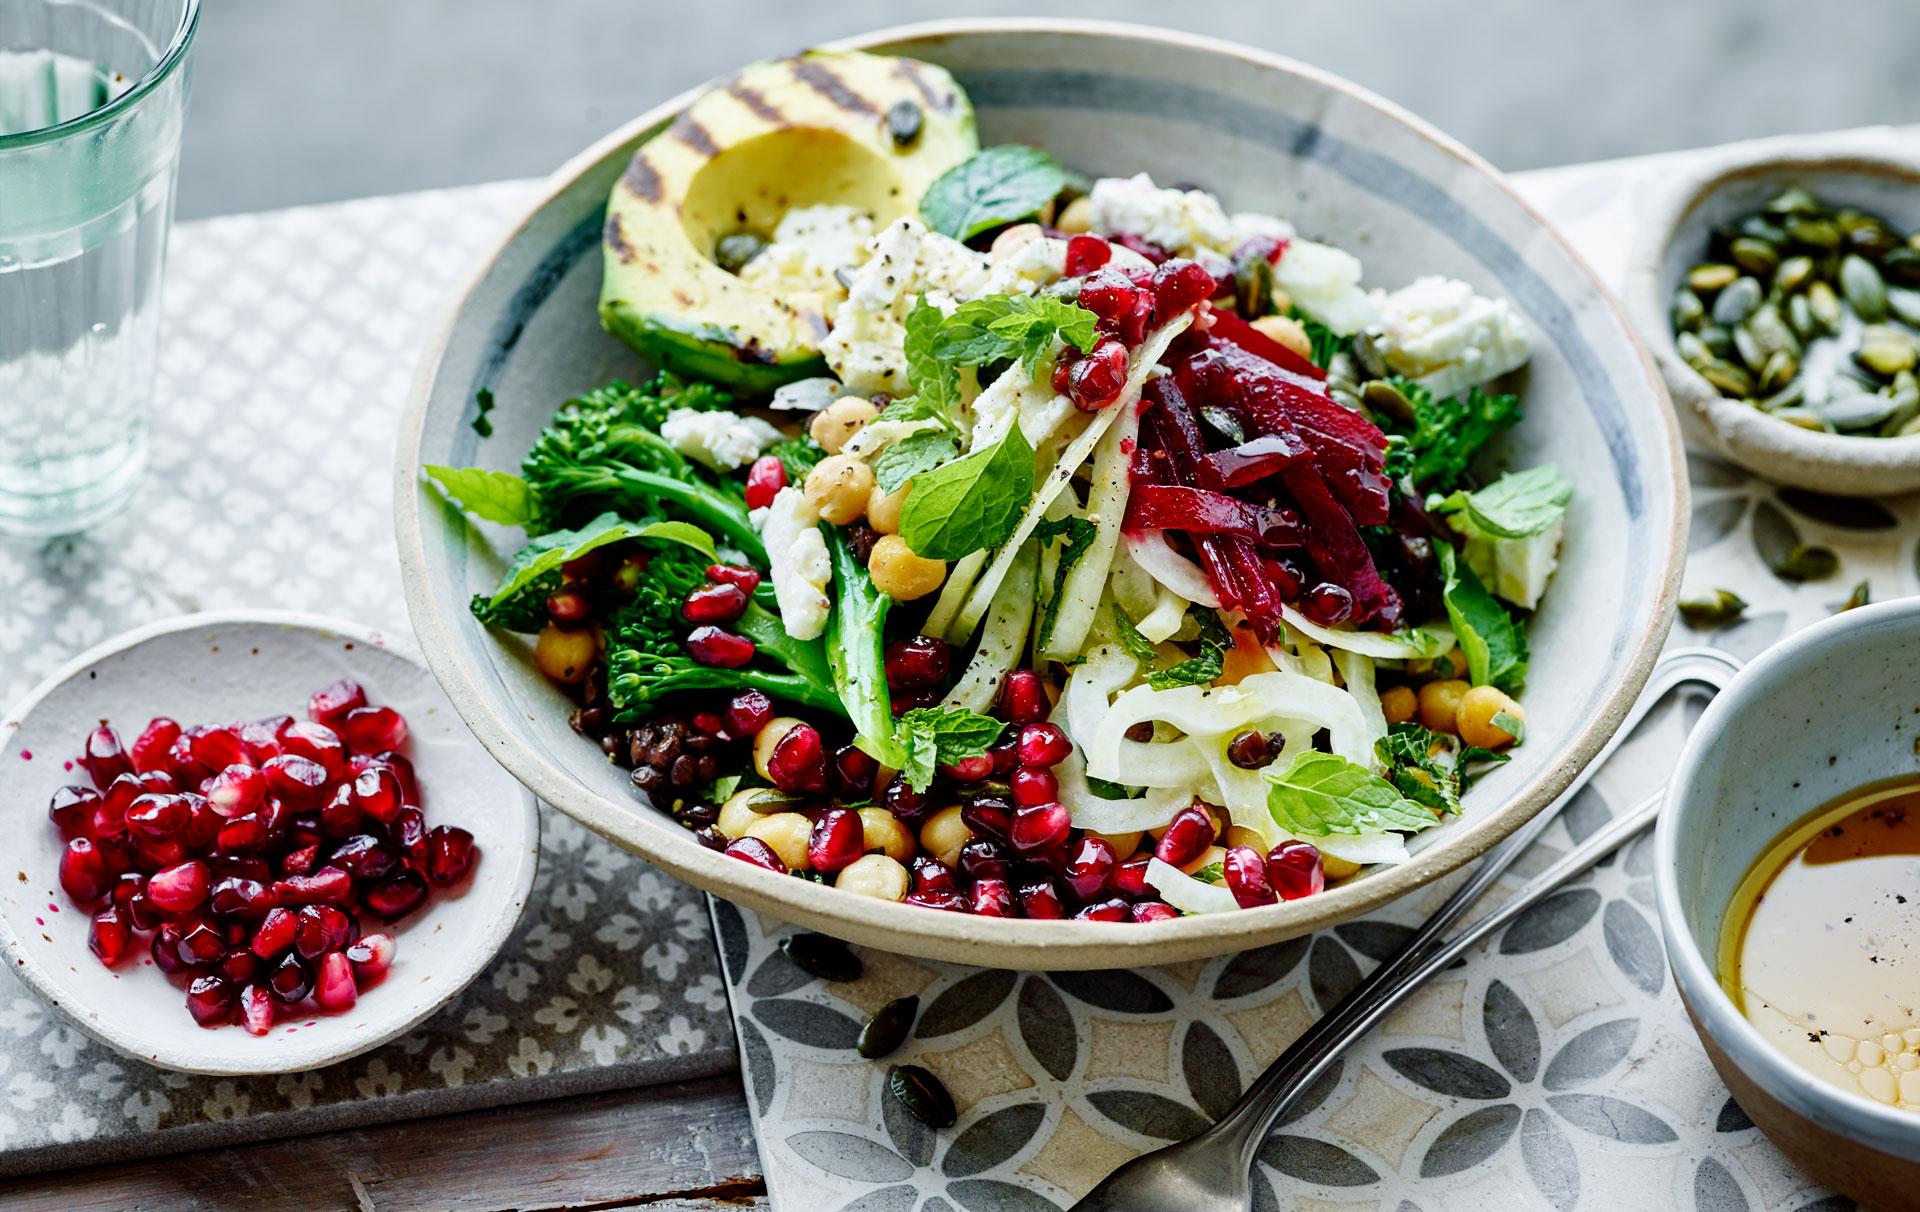 Joe Wicks Veggie Super Bowl Lunch Recipes Goodtoknow